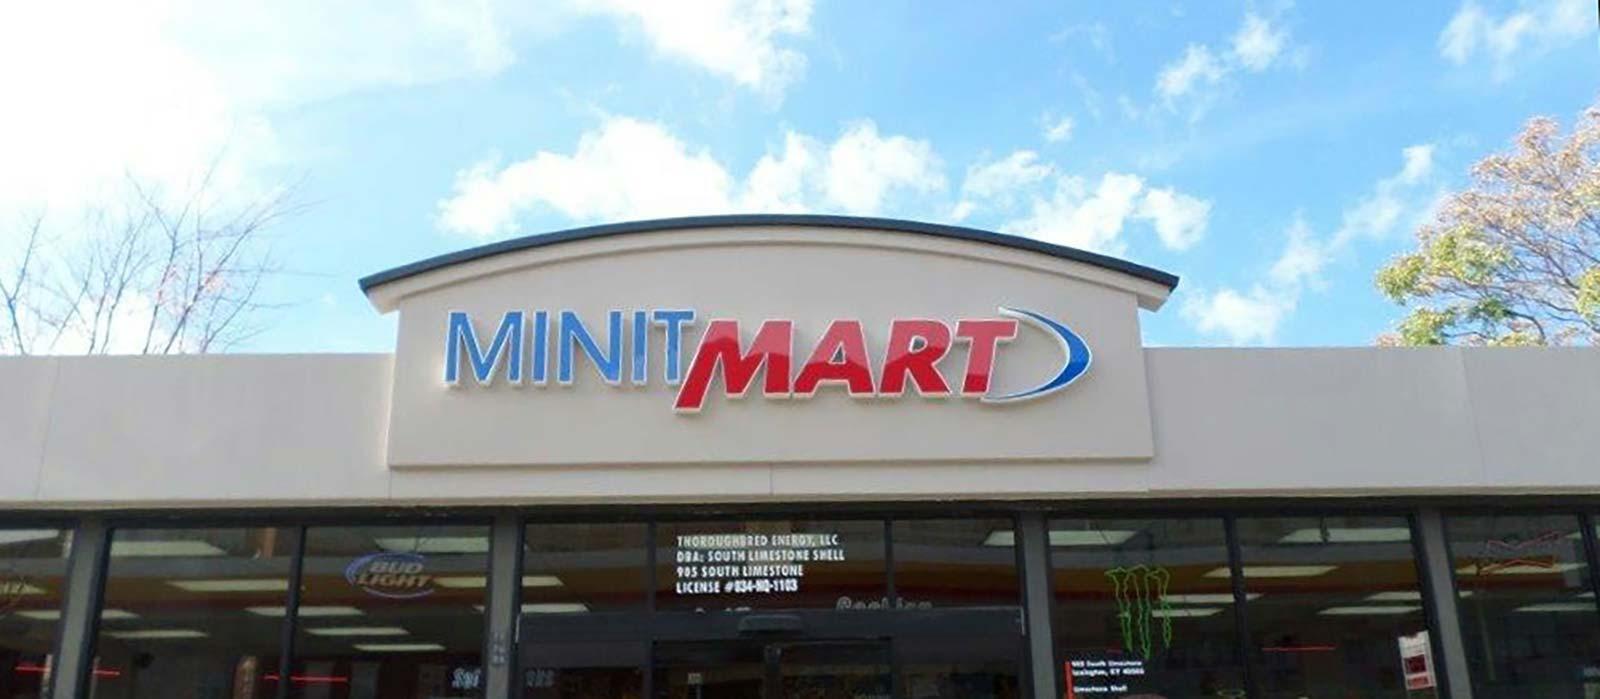 Minit Mart Channel Letters